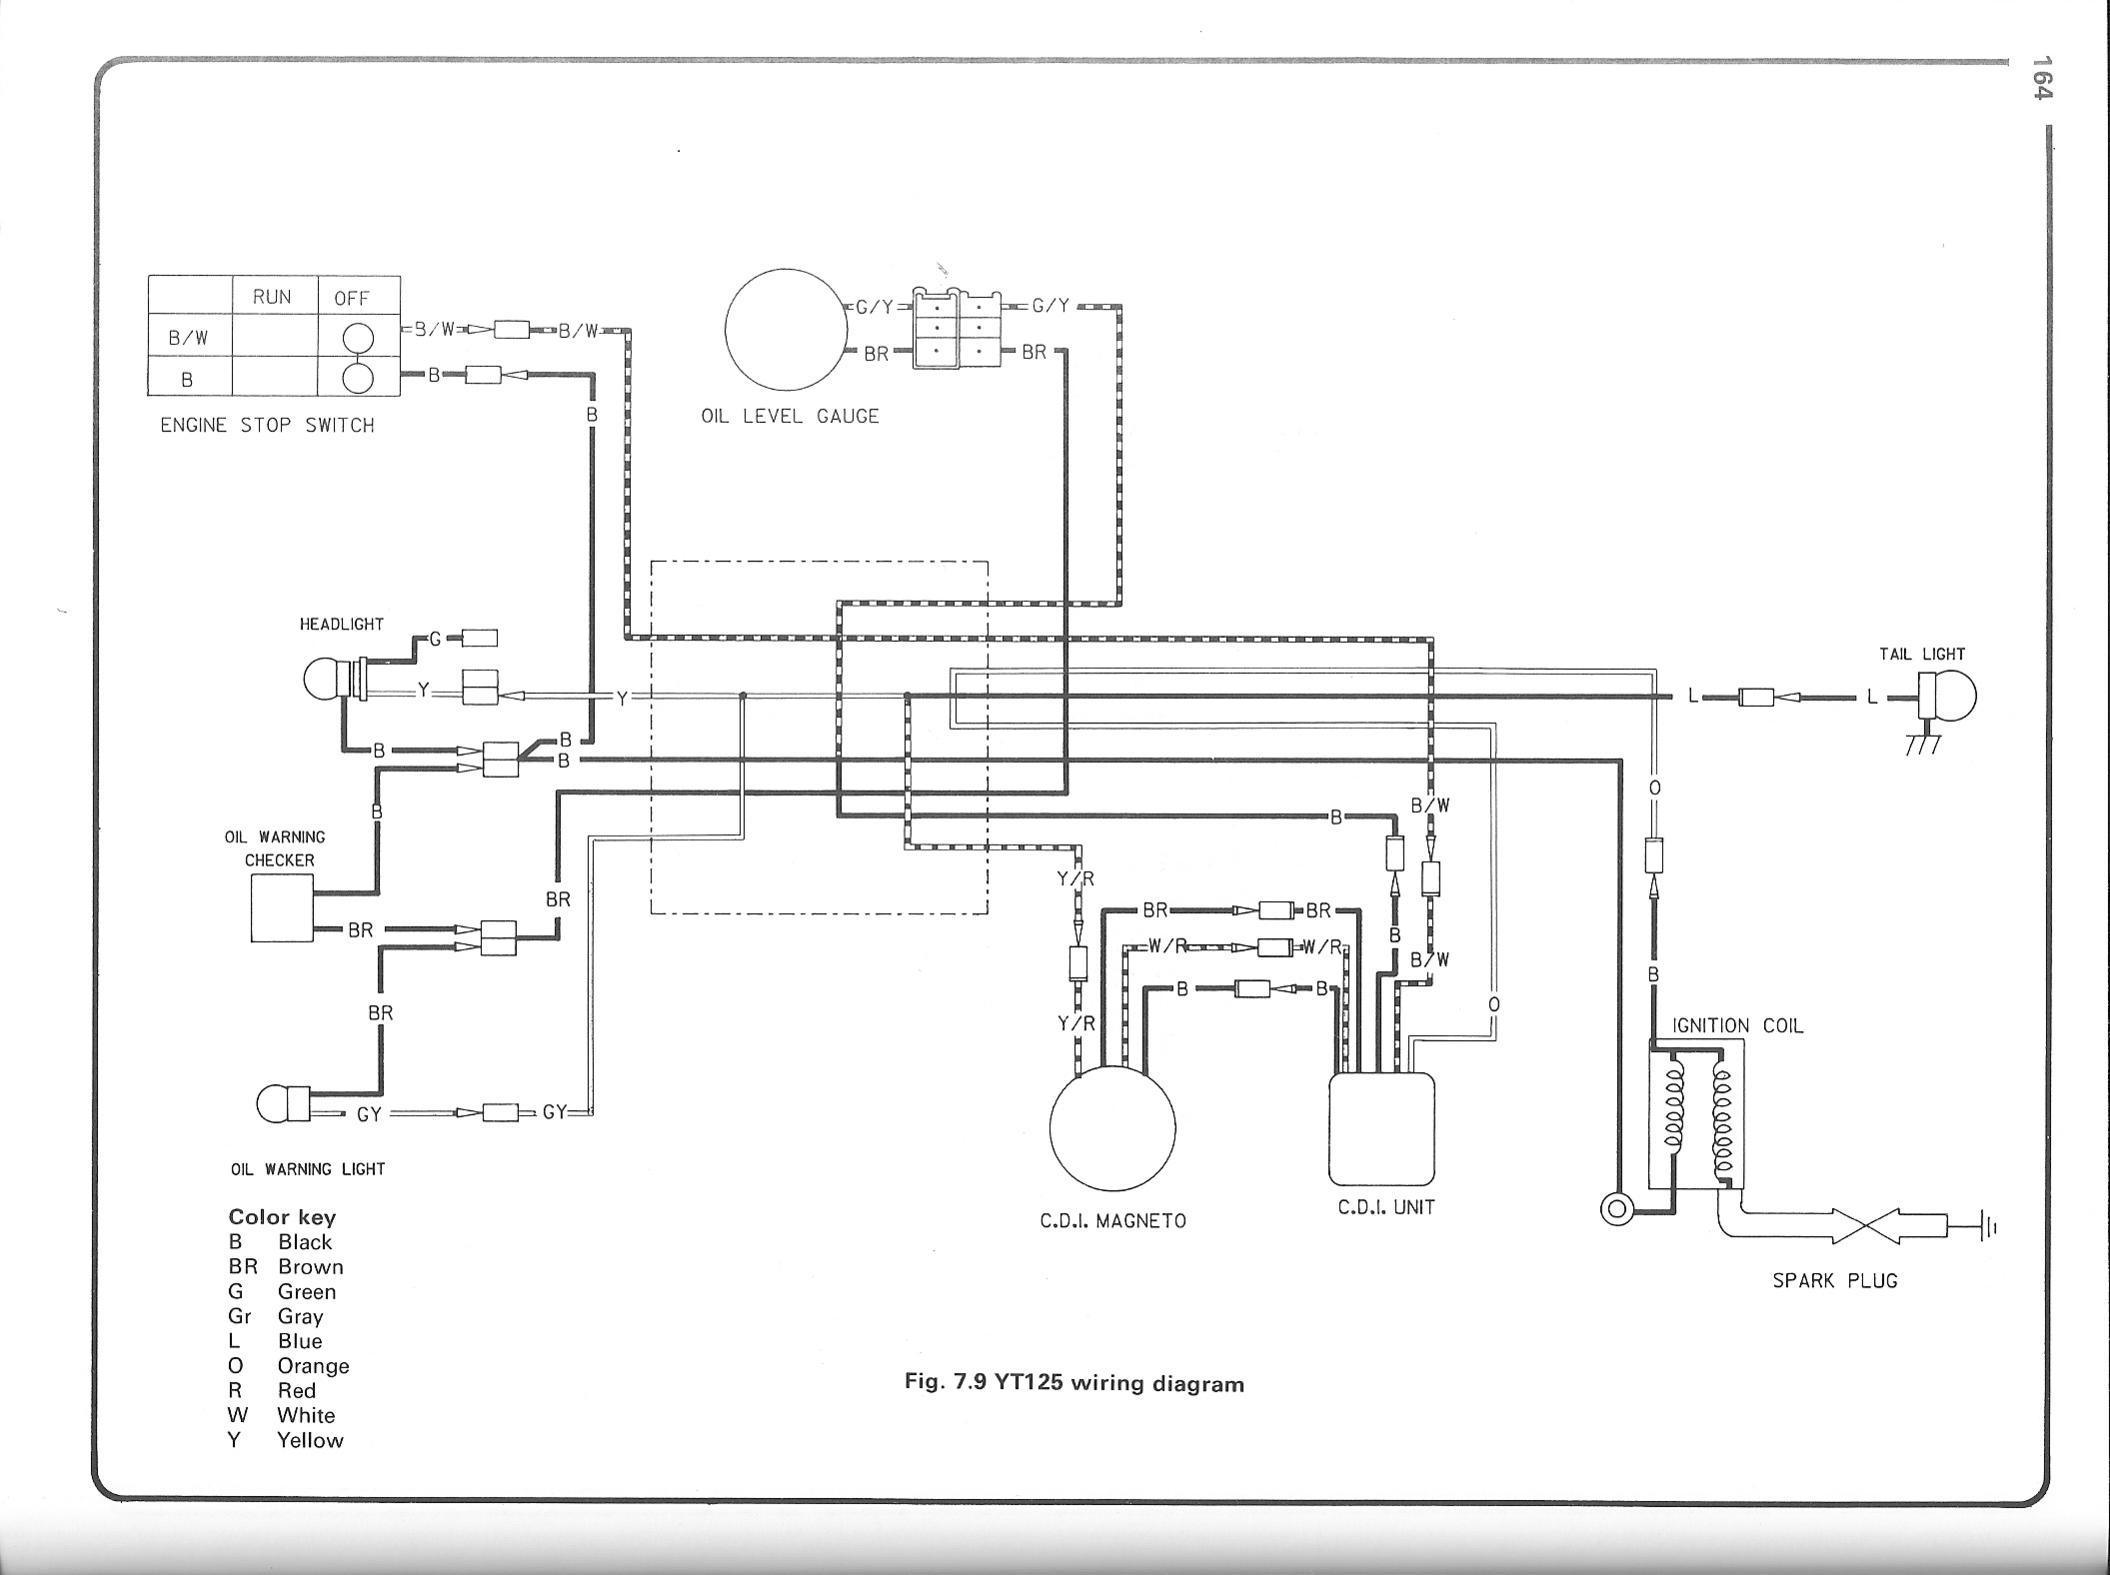 Fine Polaris Trail Boss 250 Wiring Diagram Gallery - Electrical ...